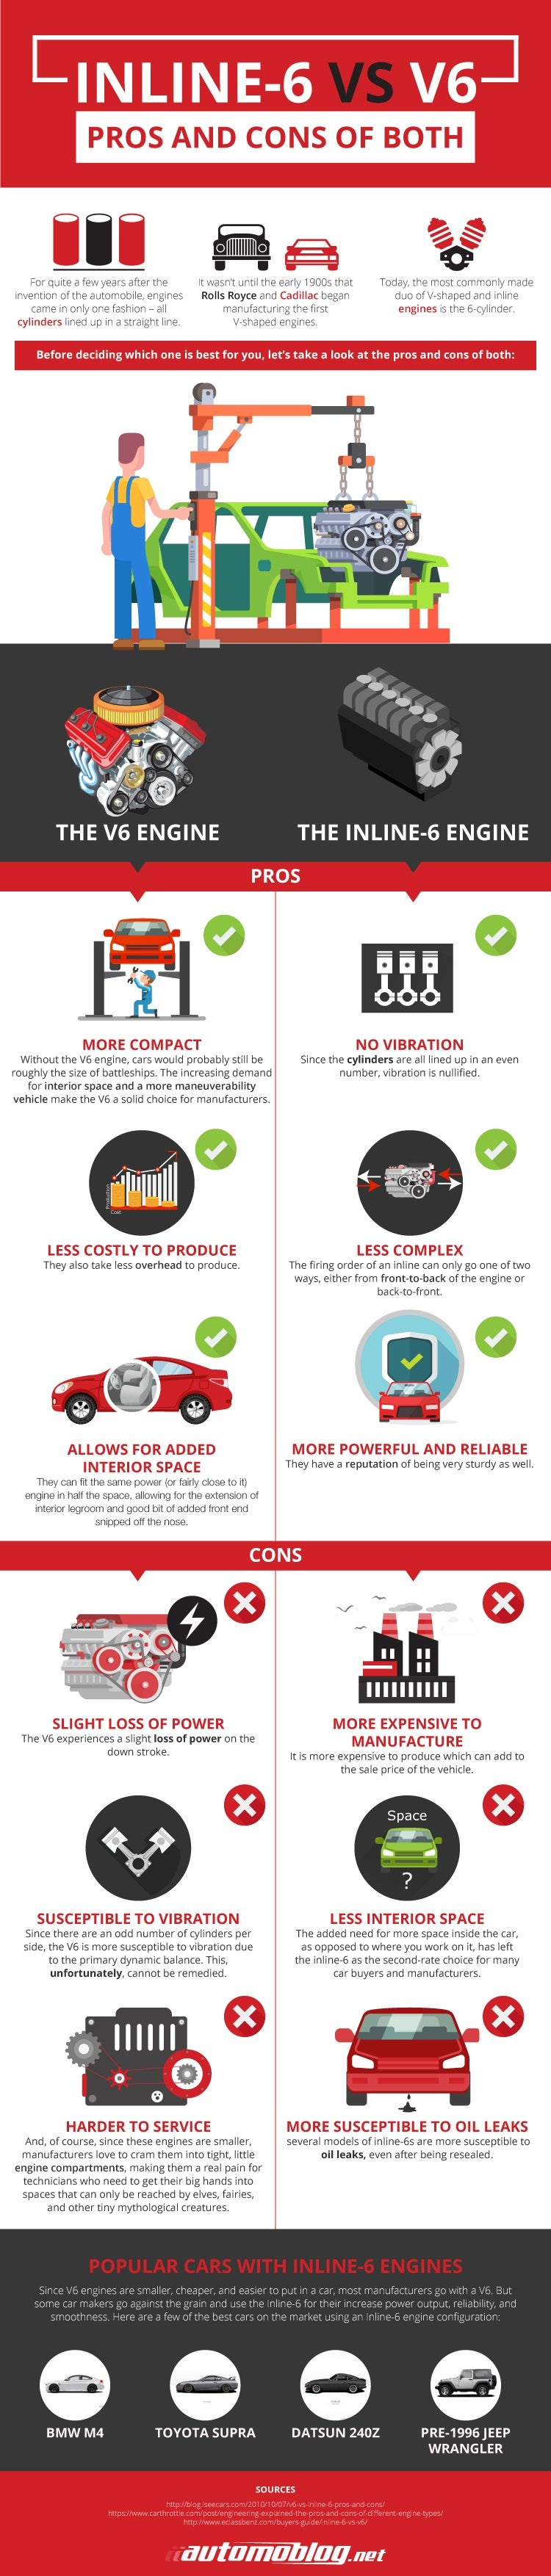 Inline 6 vs V6 infographic